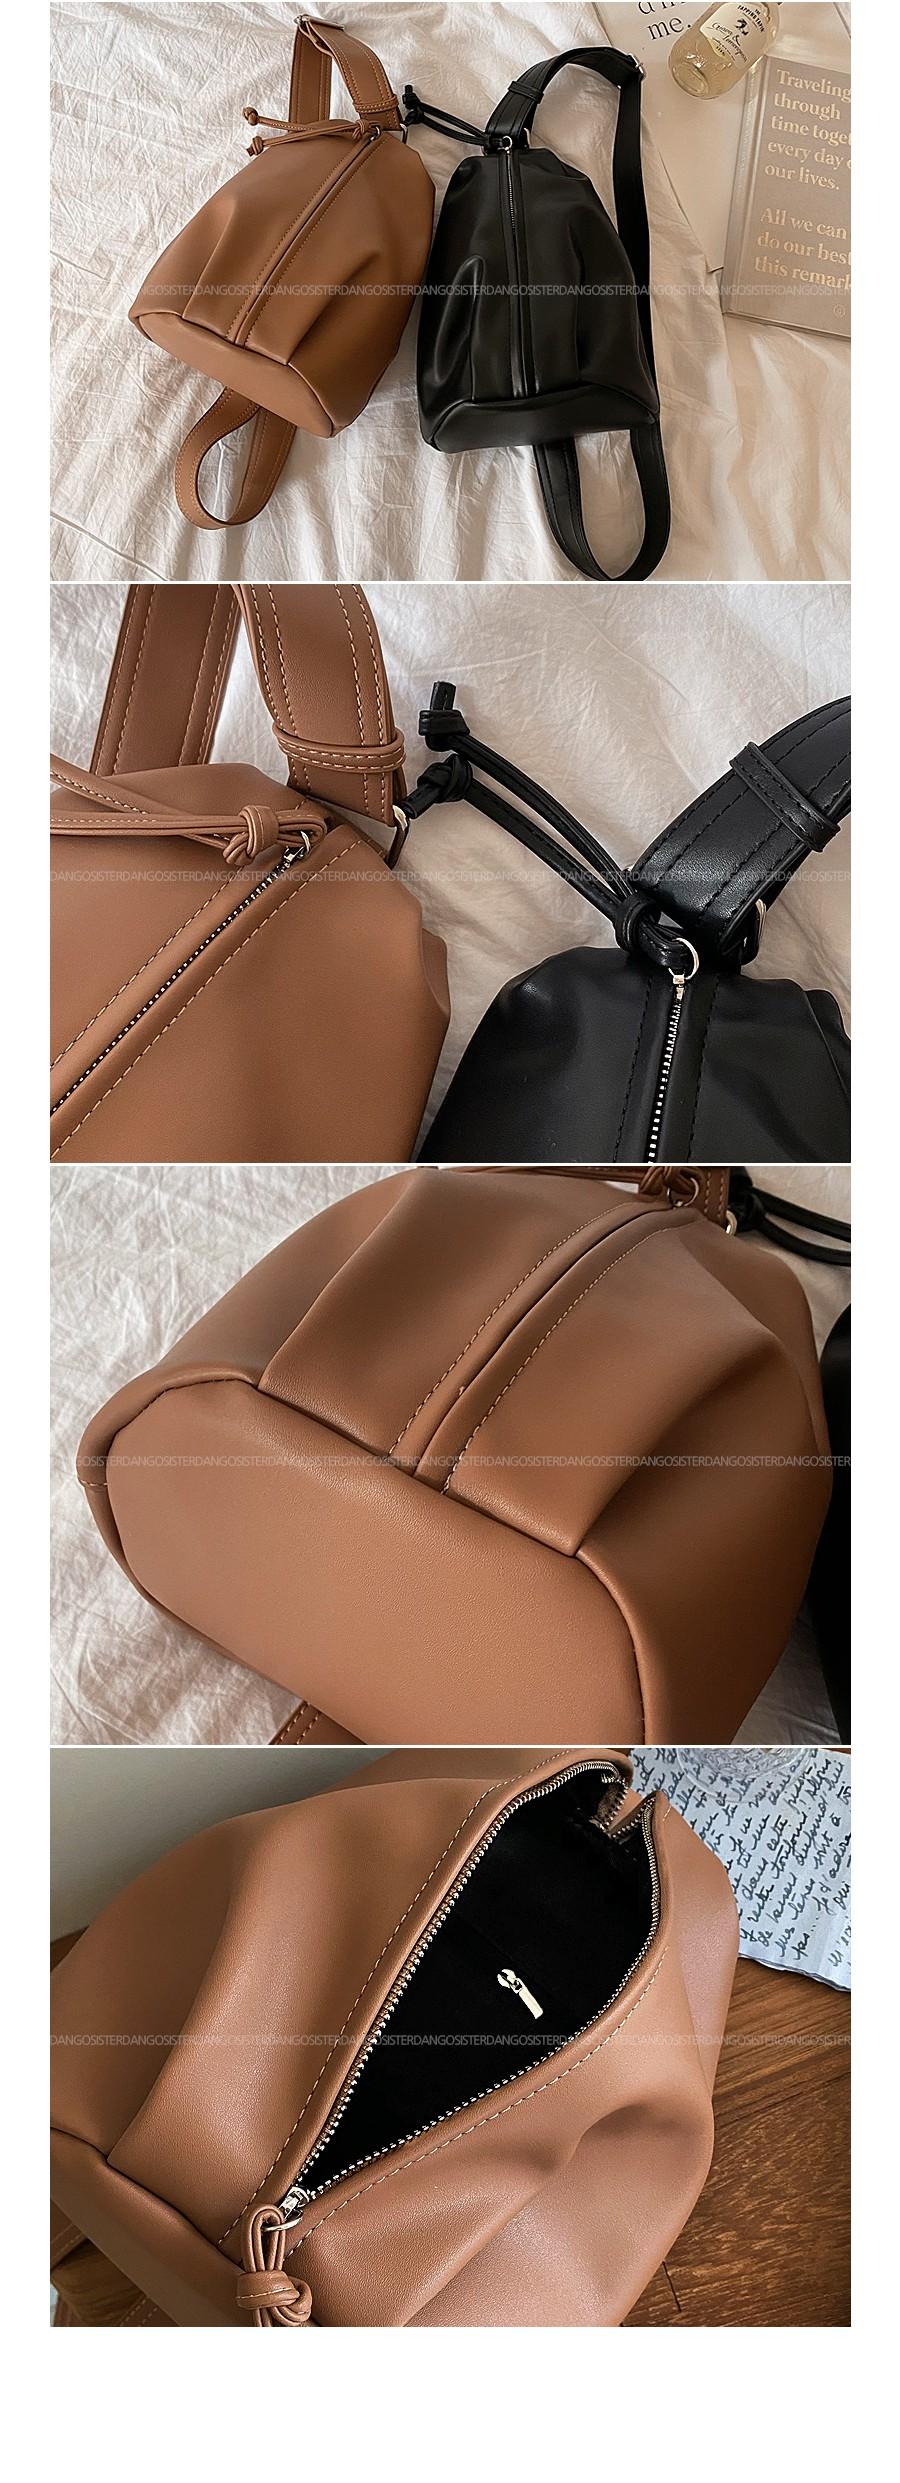 Howell Zipper Bag